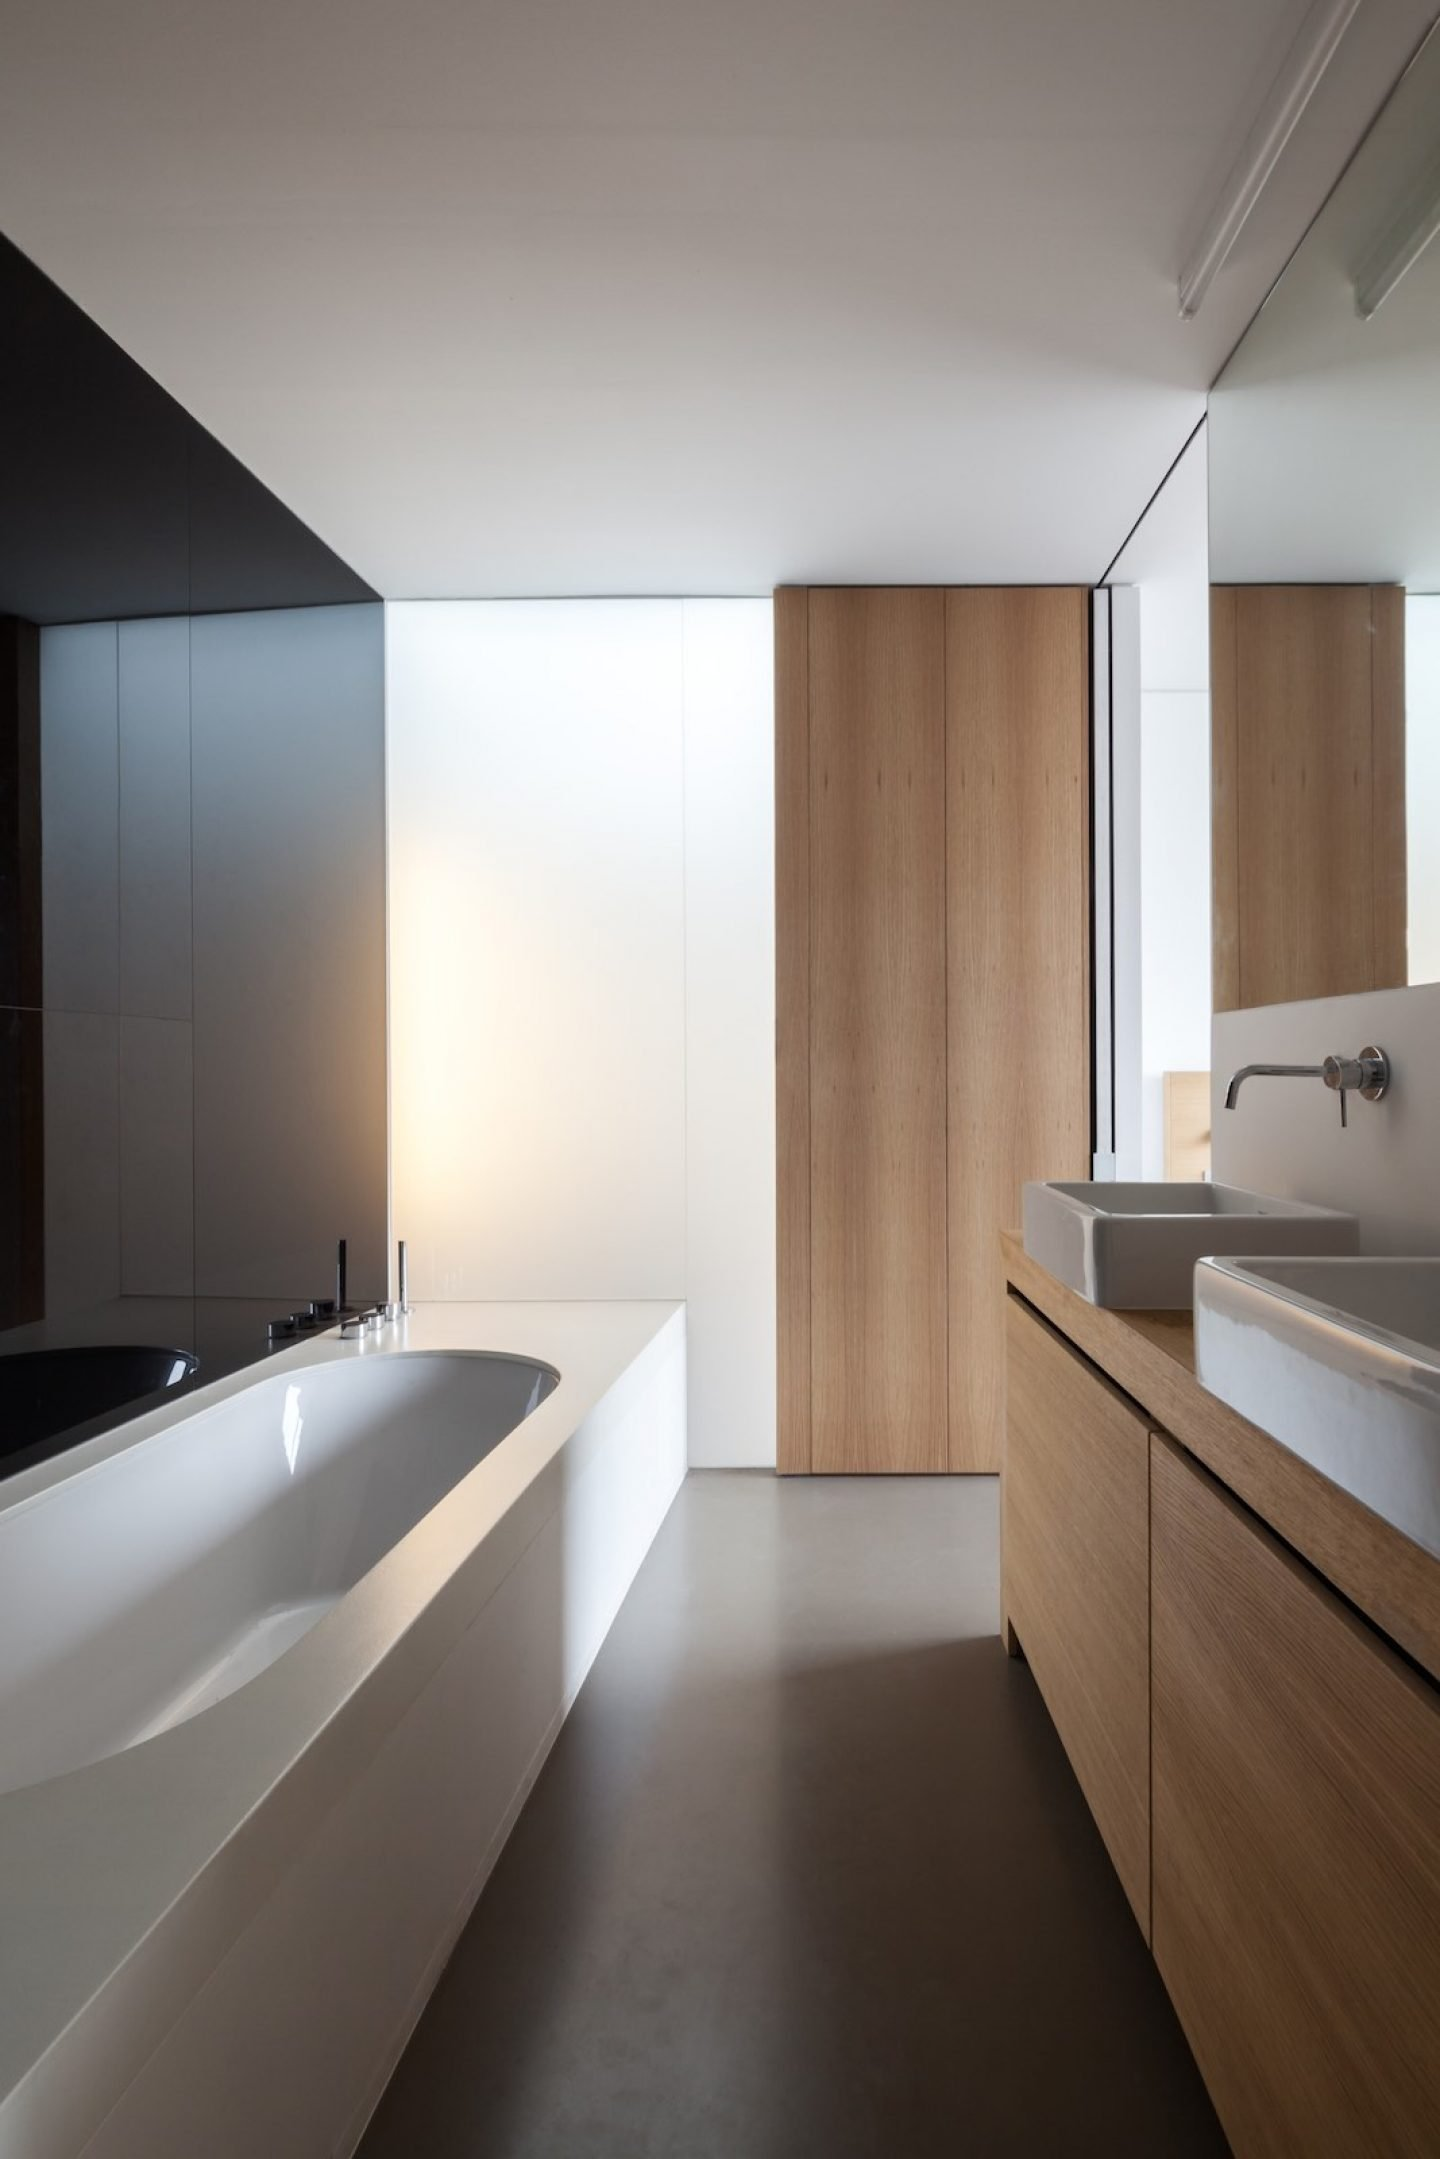 Architecture_AbeelHouse_StevenVandenborre_MiassArchitecture_12